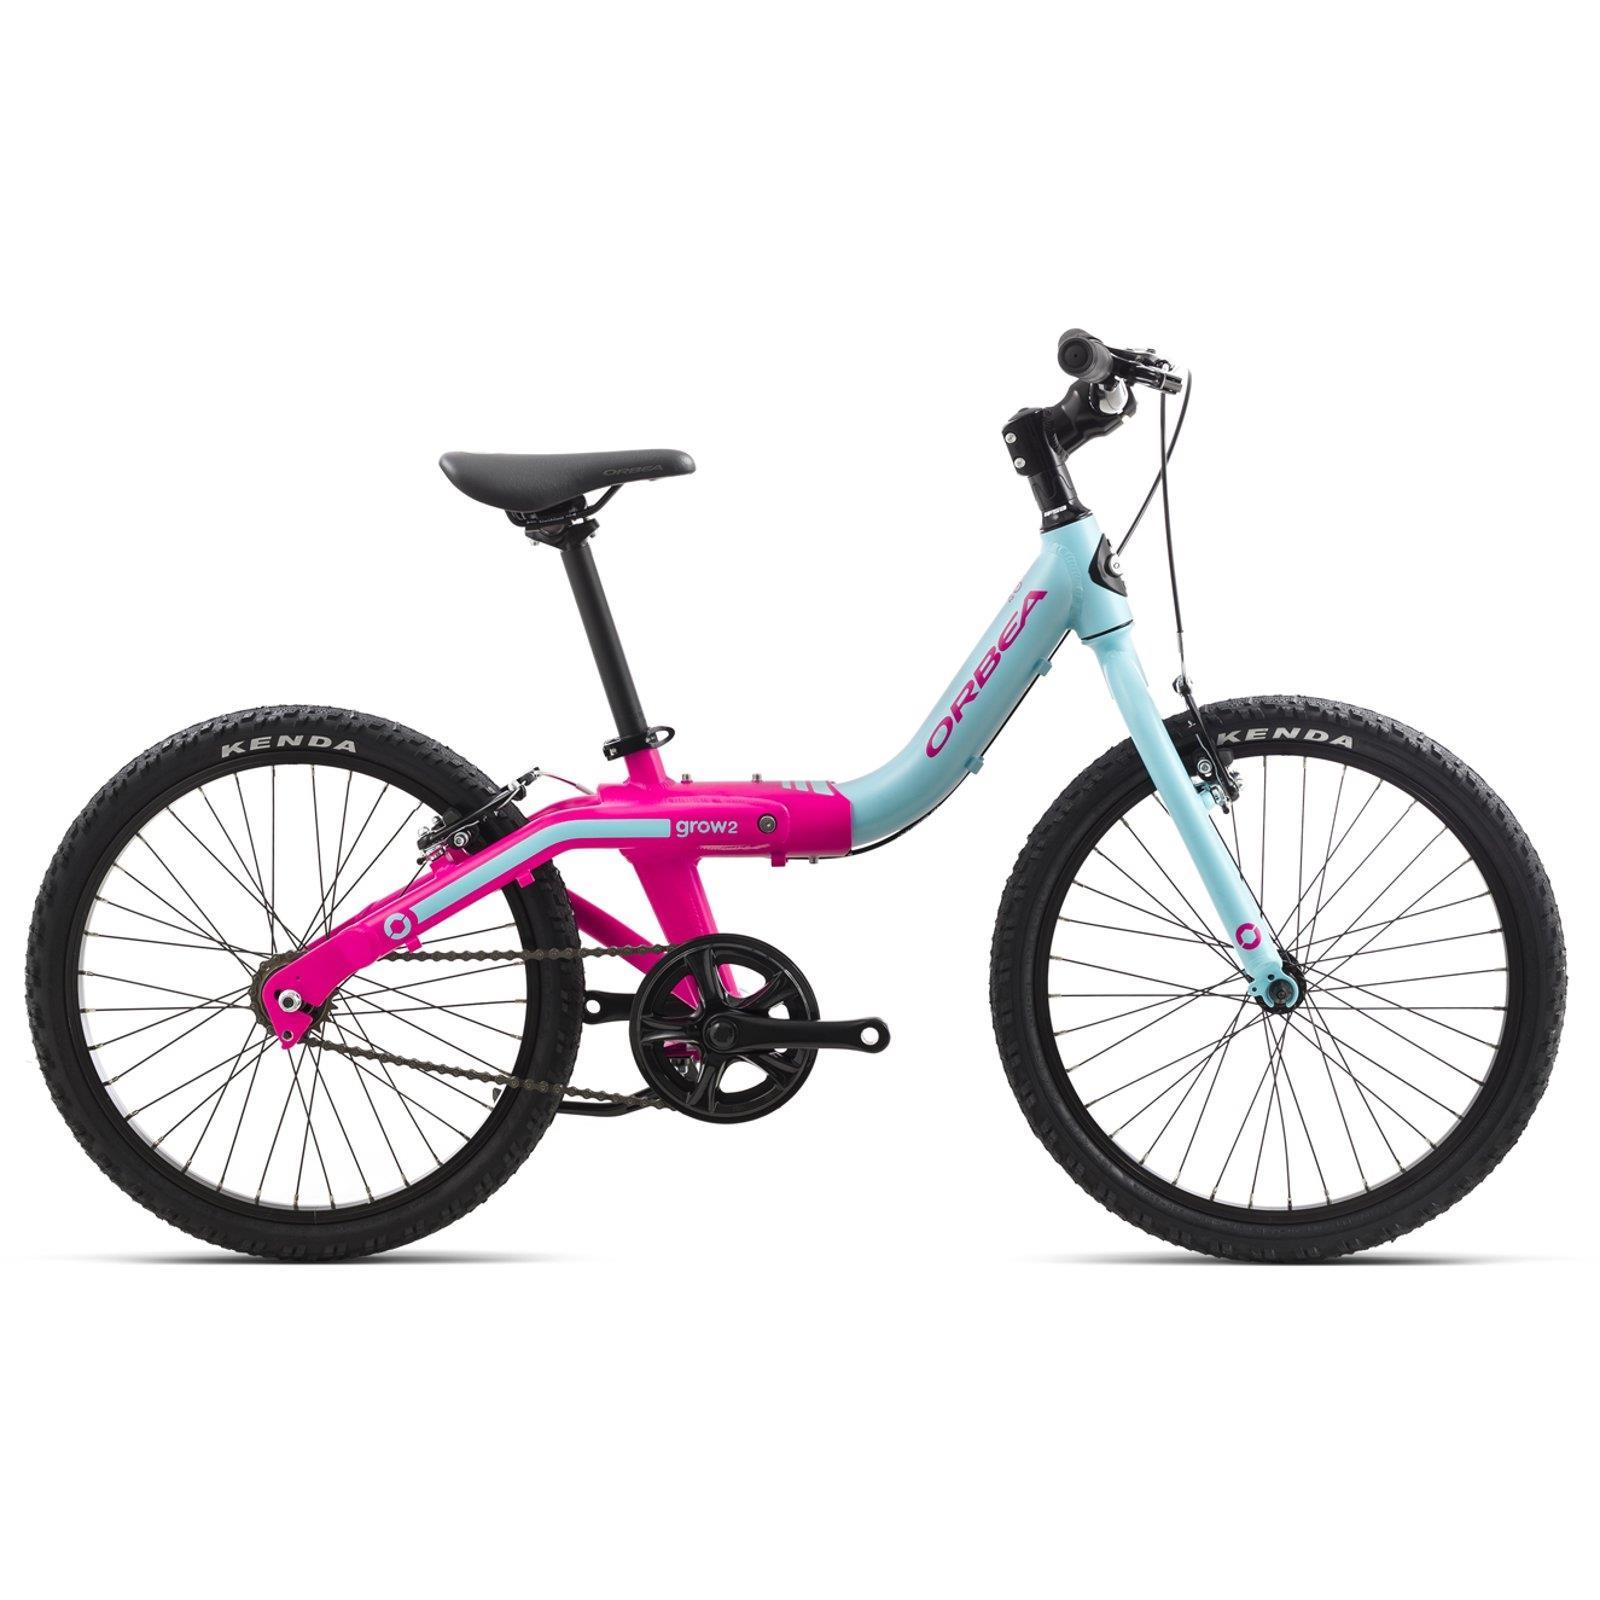 orbea grow 2 kinder fahrrad 20 zoll 1 gang rad aluminium. Black Bedroom Furniture Sets. Home Design Ideas